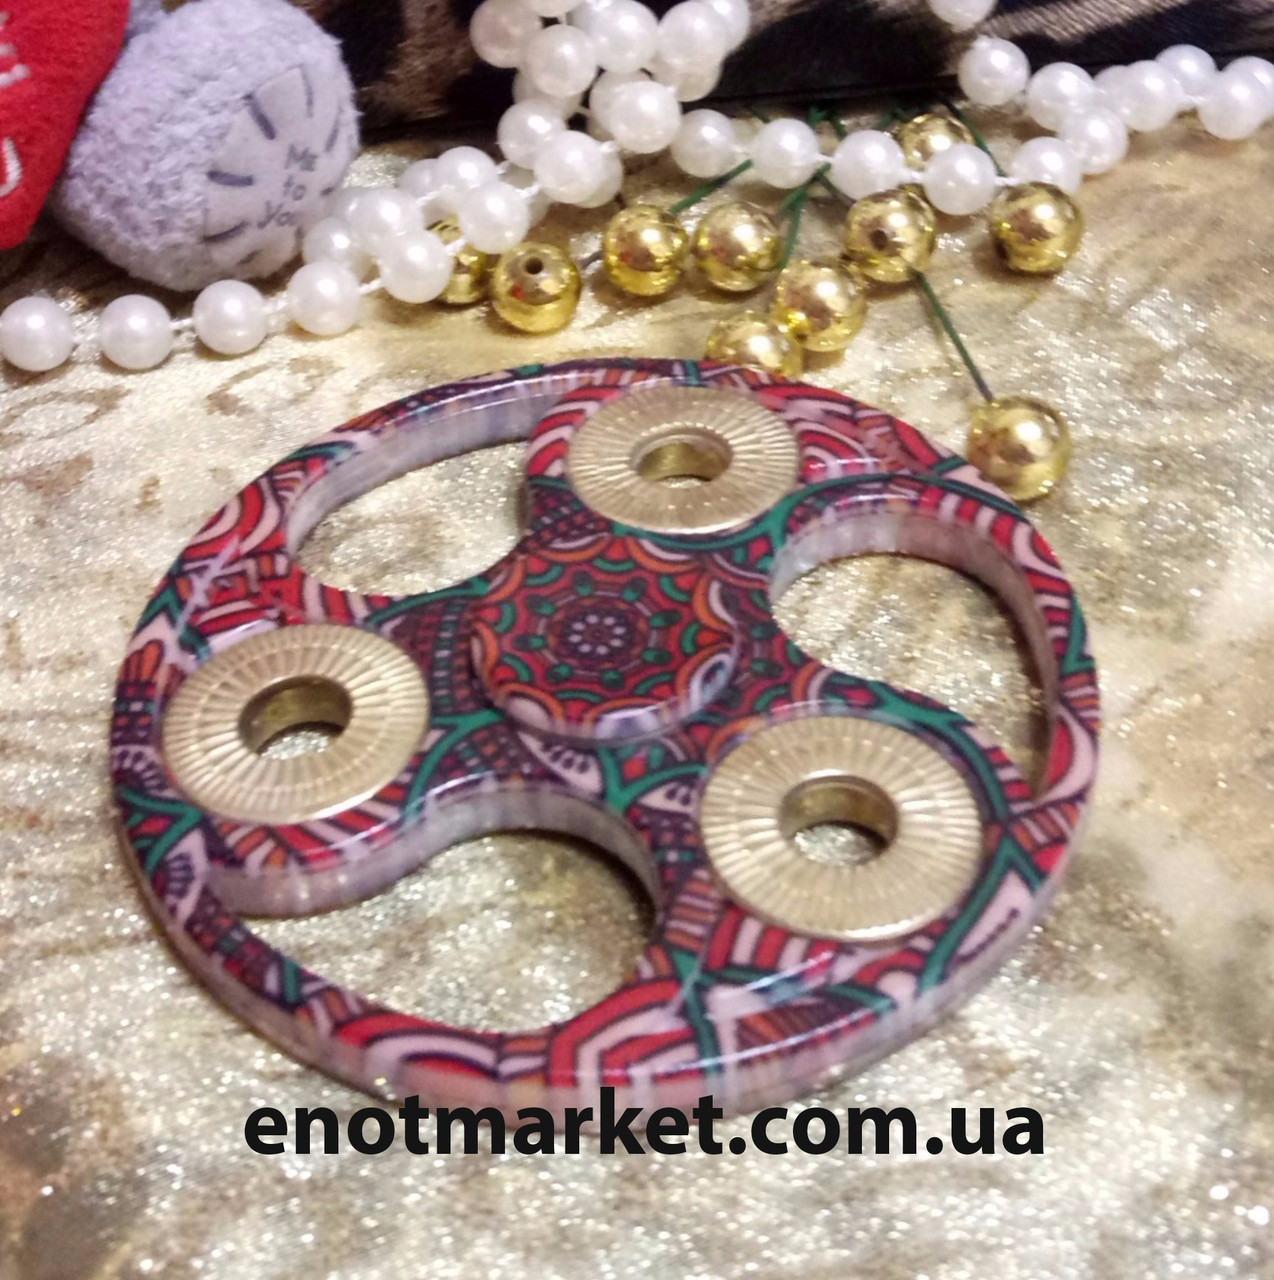 Спиннер, вертушка, крутилка для рук, finger spinner, hand spinner, spinner fidget toys керамический цветной, фото 1